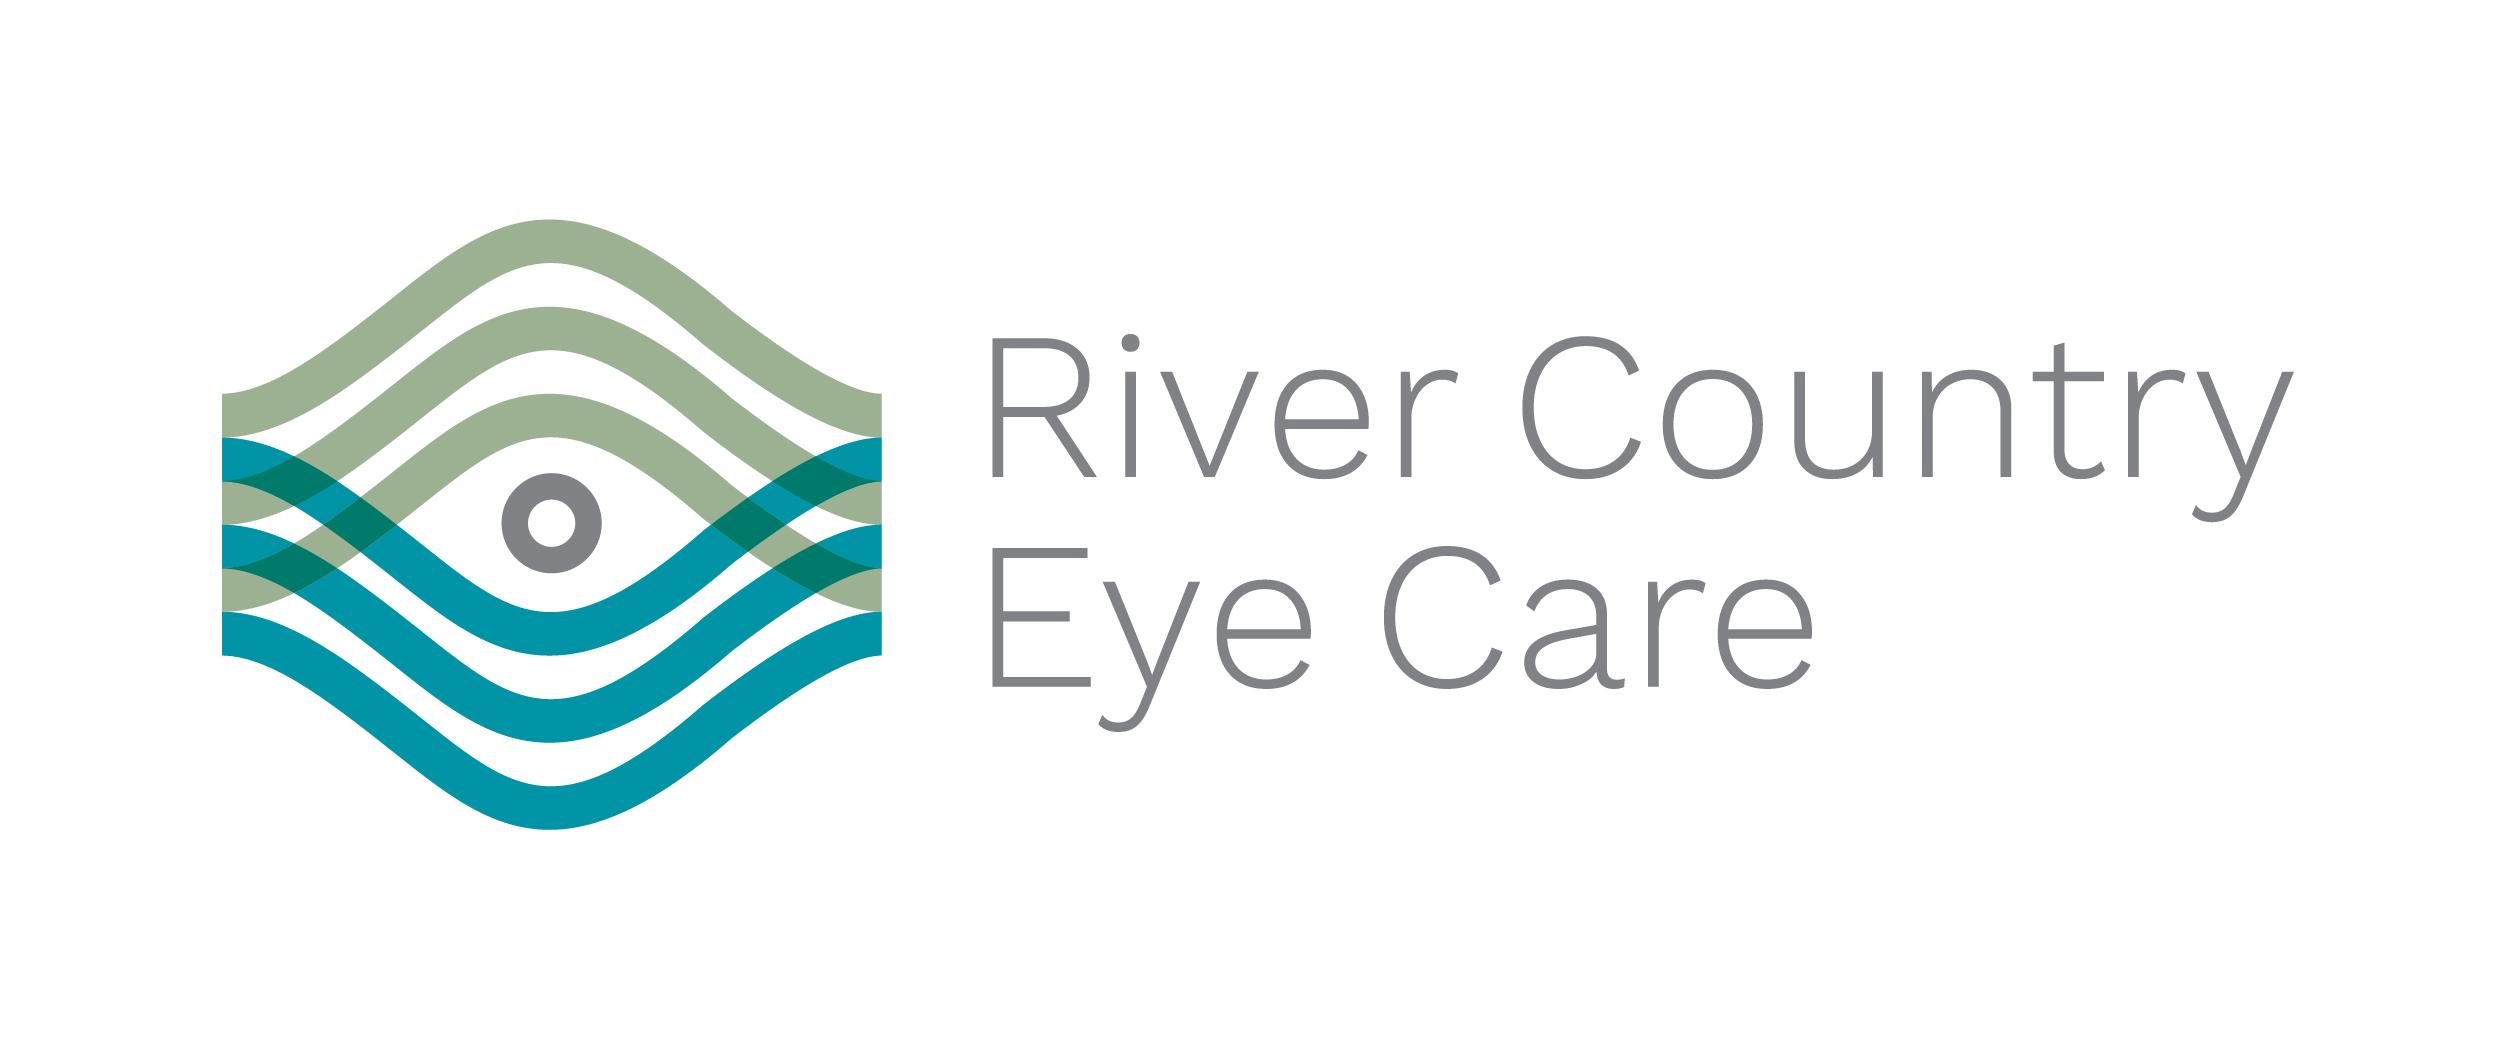 River Country Eye Care logo